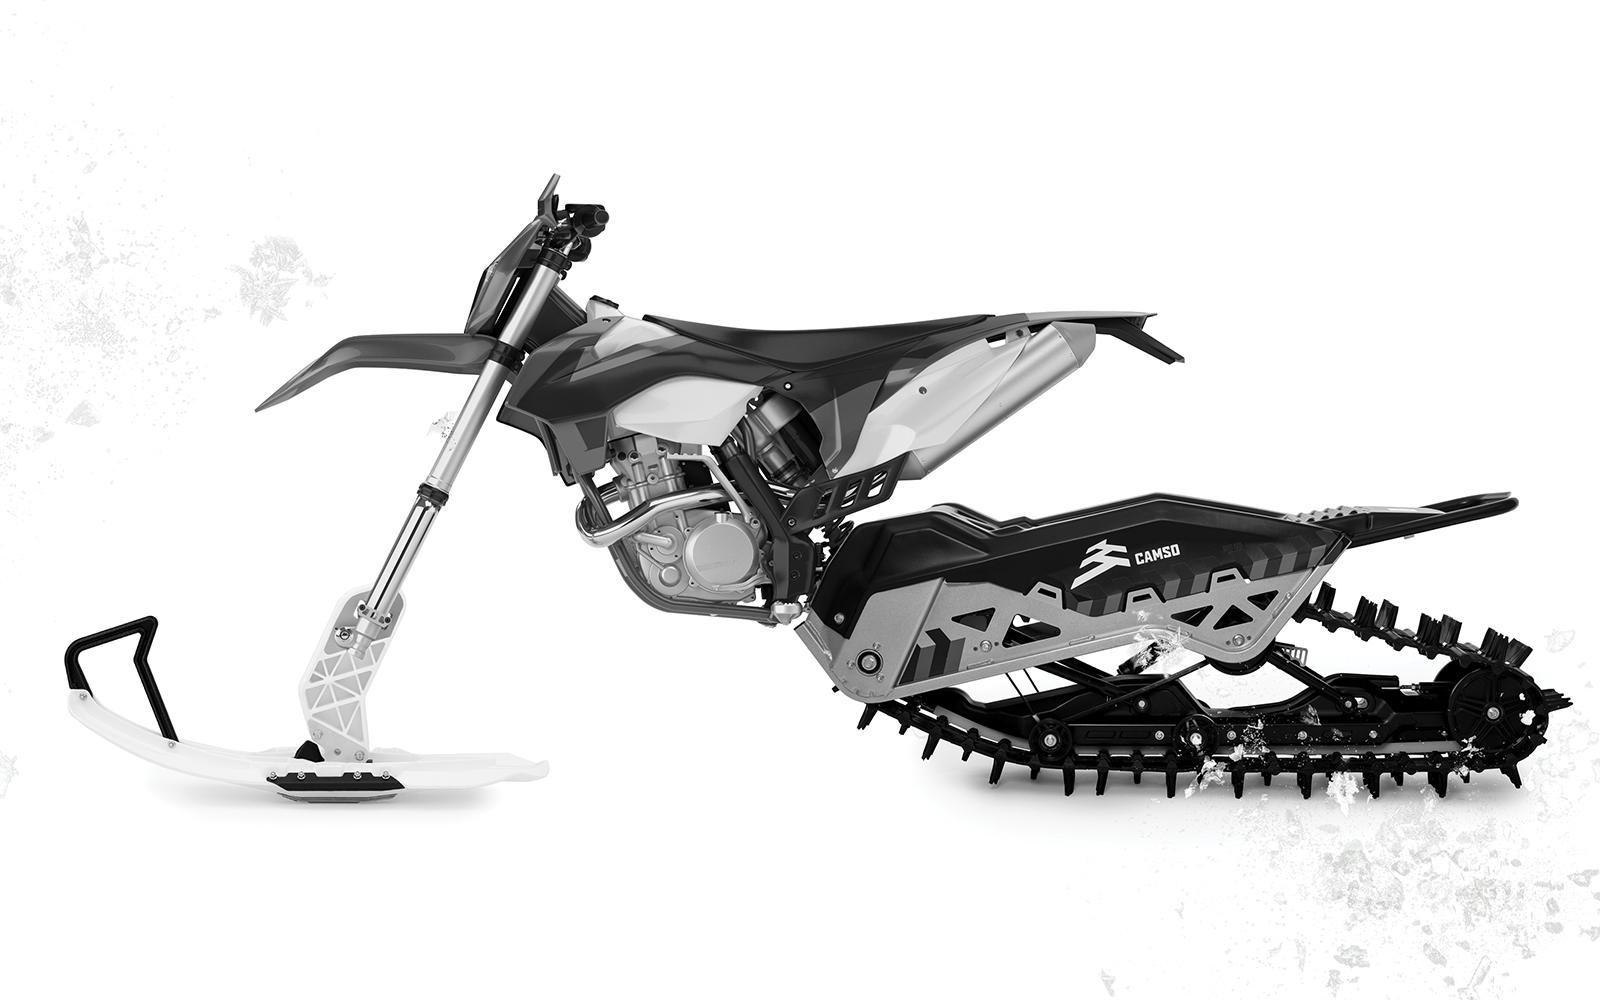 Camso DTS 129 kiinnityssarja 29-0589 KTM SX-F / XC-F 450 -2014